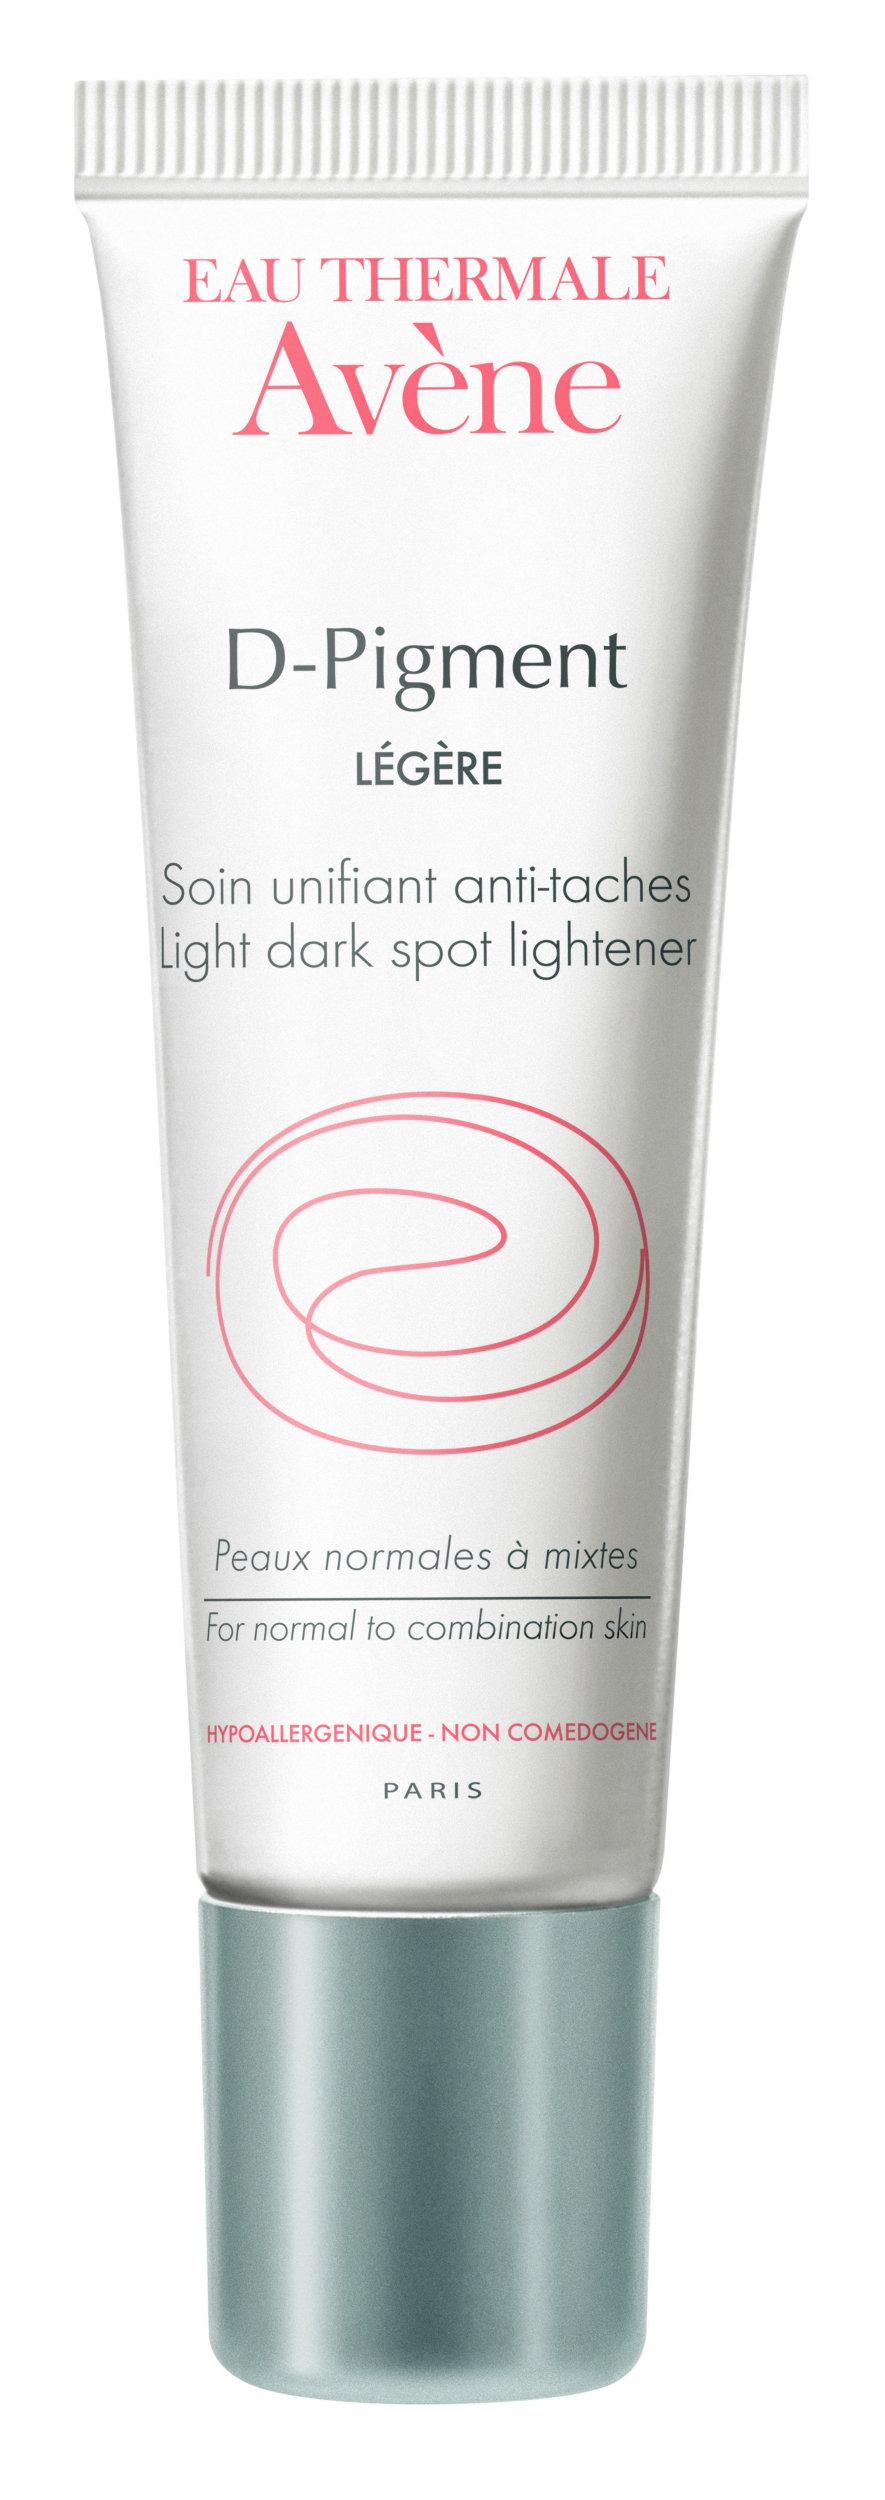 Avene D Pigment Dark Spot Corrector Review, Price & Buy Online India